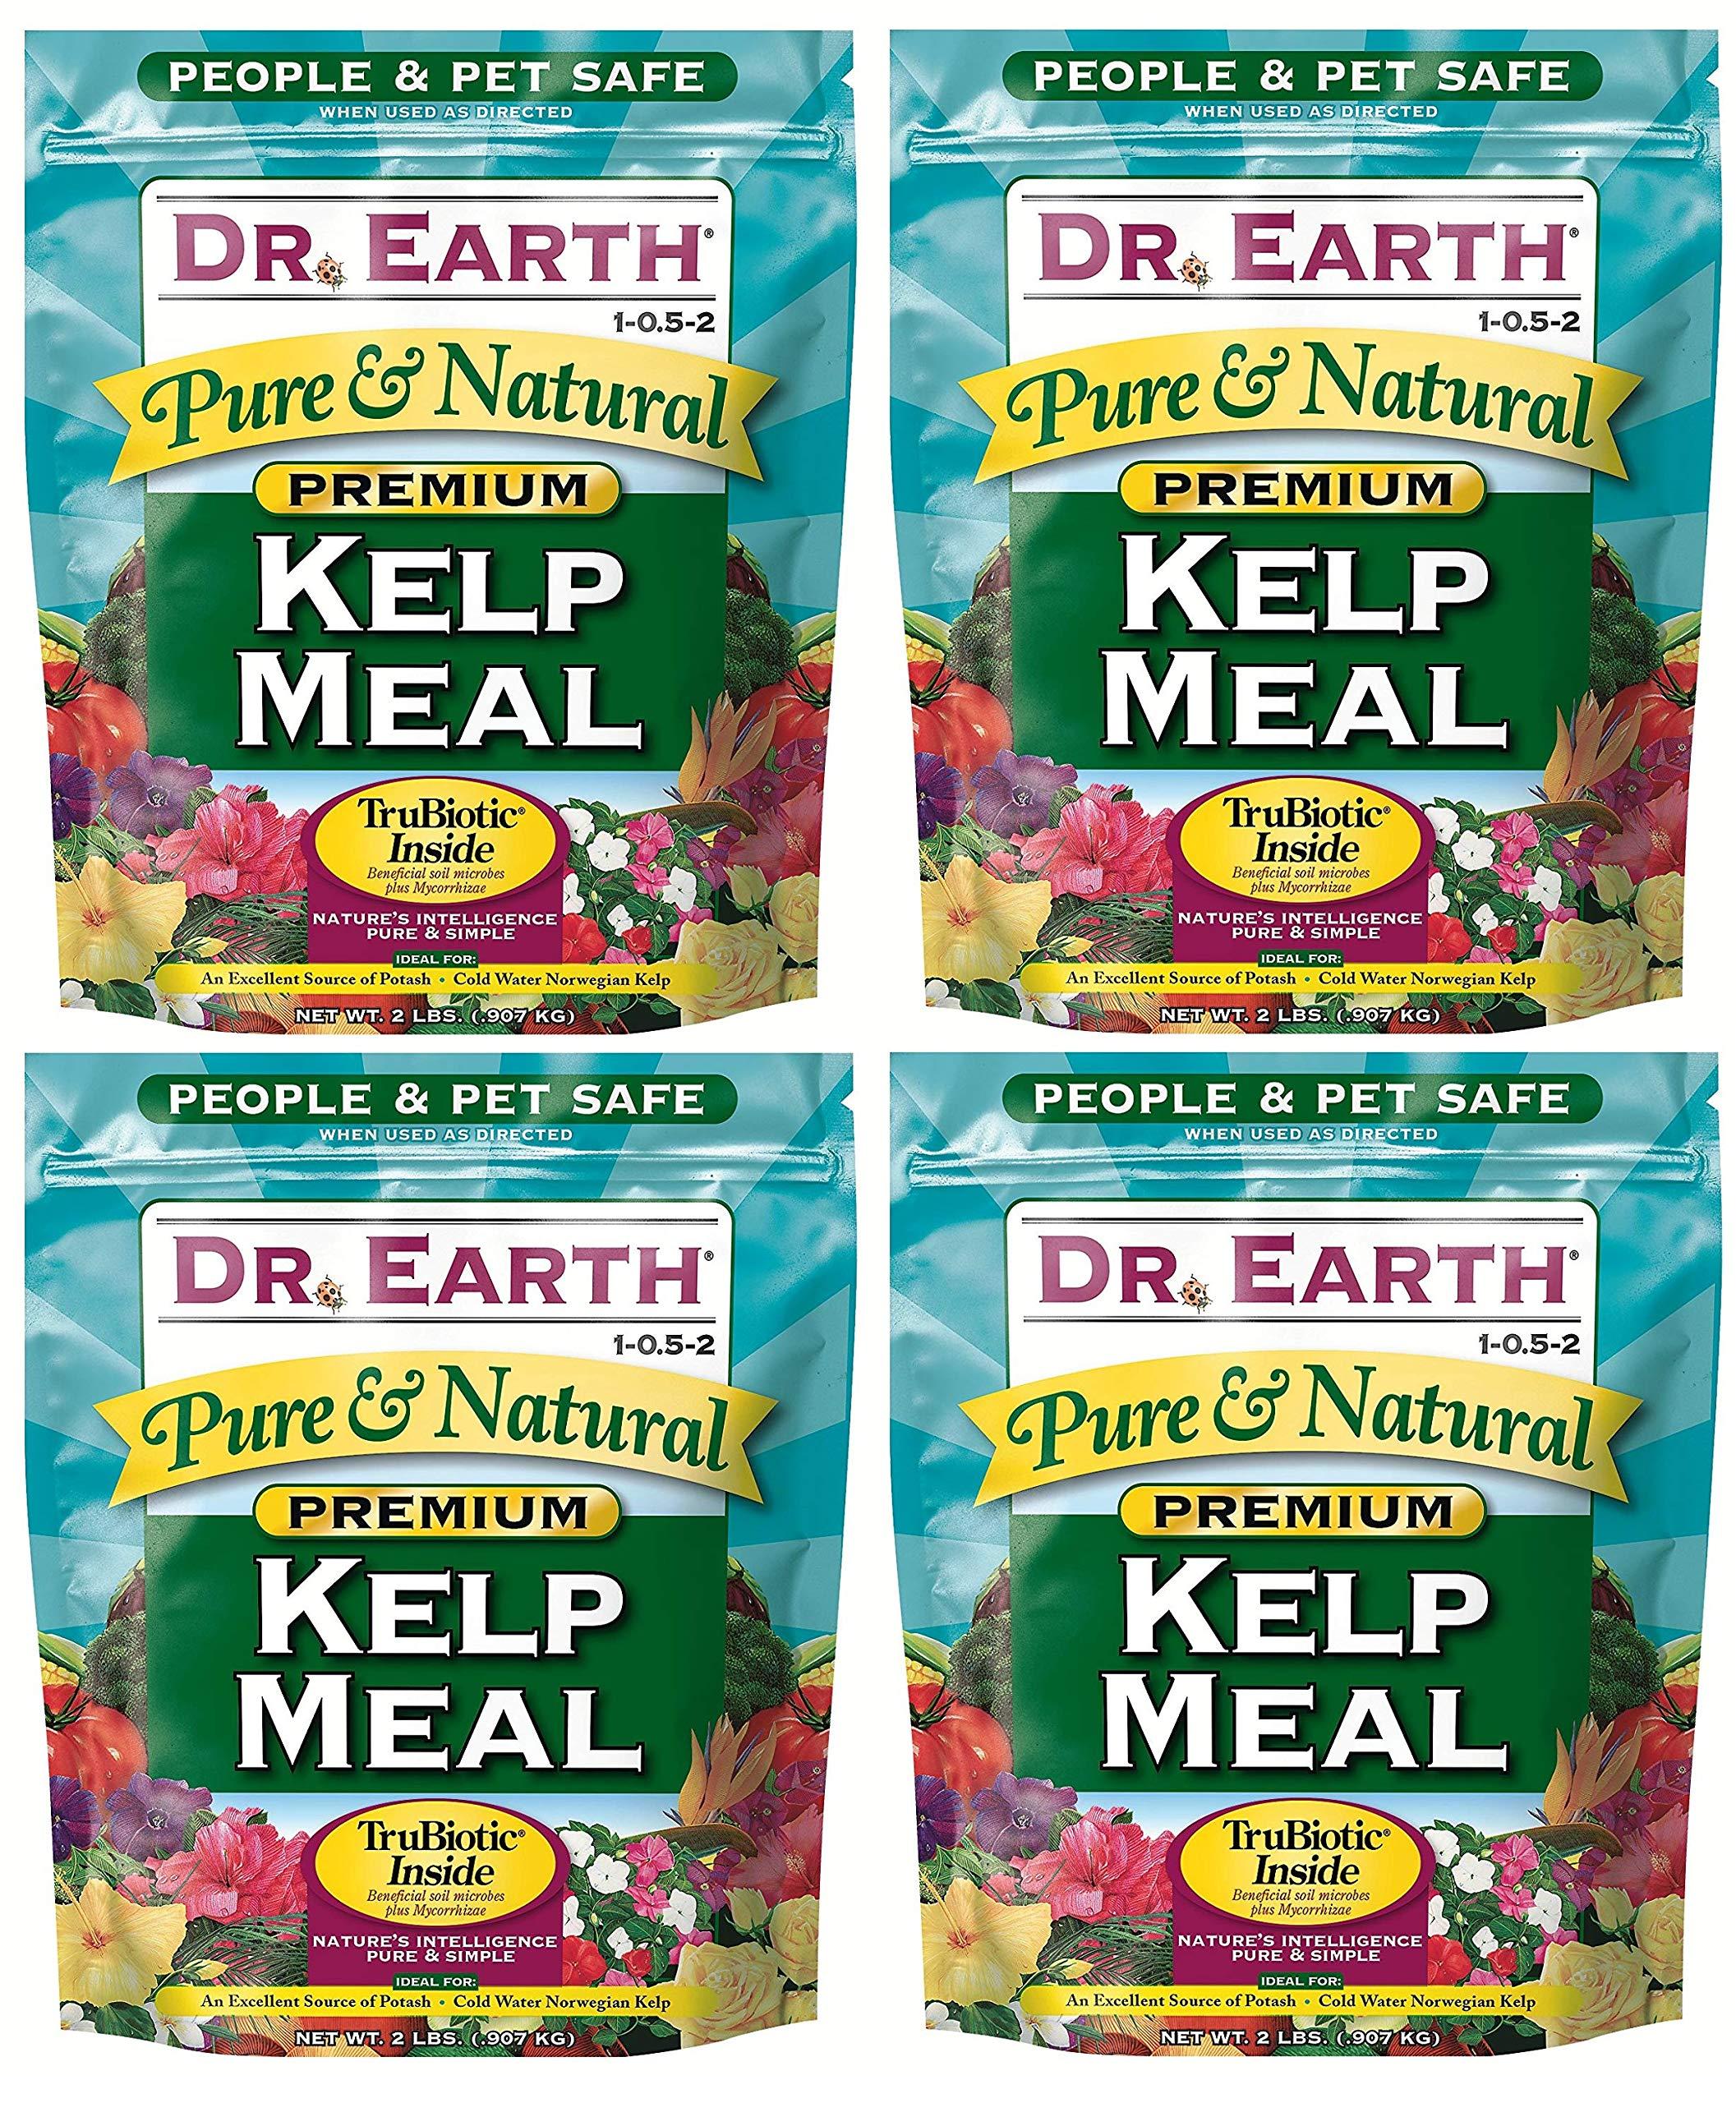 Dr. Earth 725 Kelp Meal 1-0. 5-2 2.5 Boxed, 2-Pound (Вundlе оf Fоur)